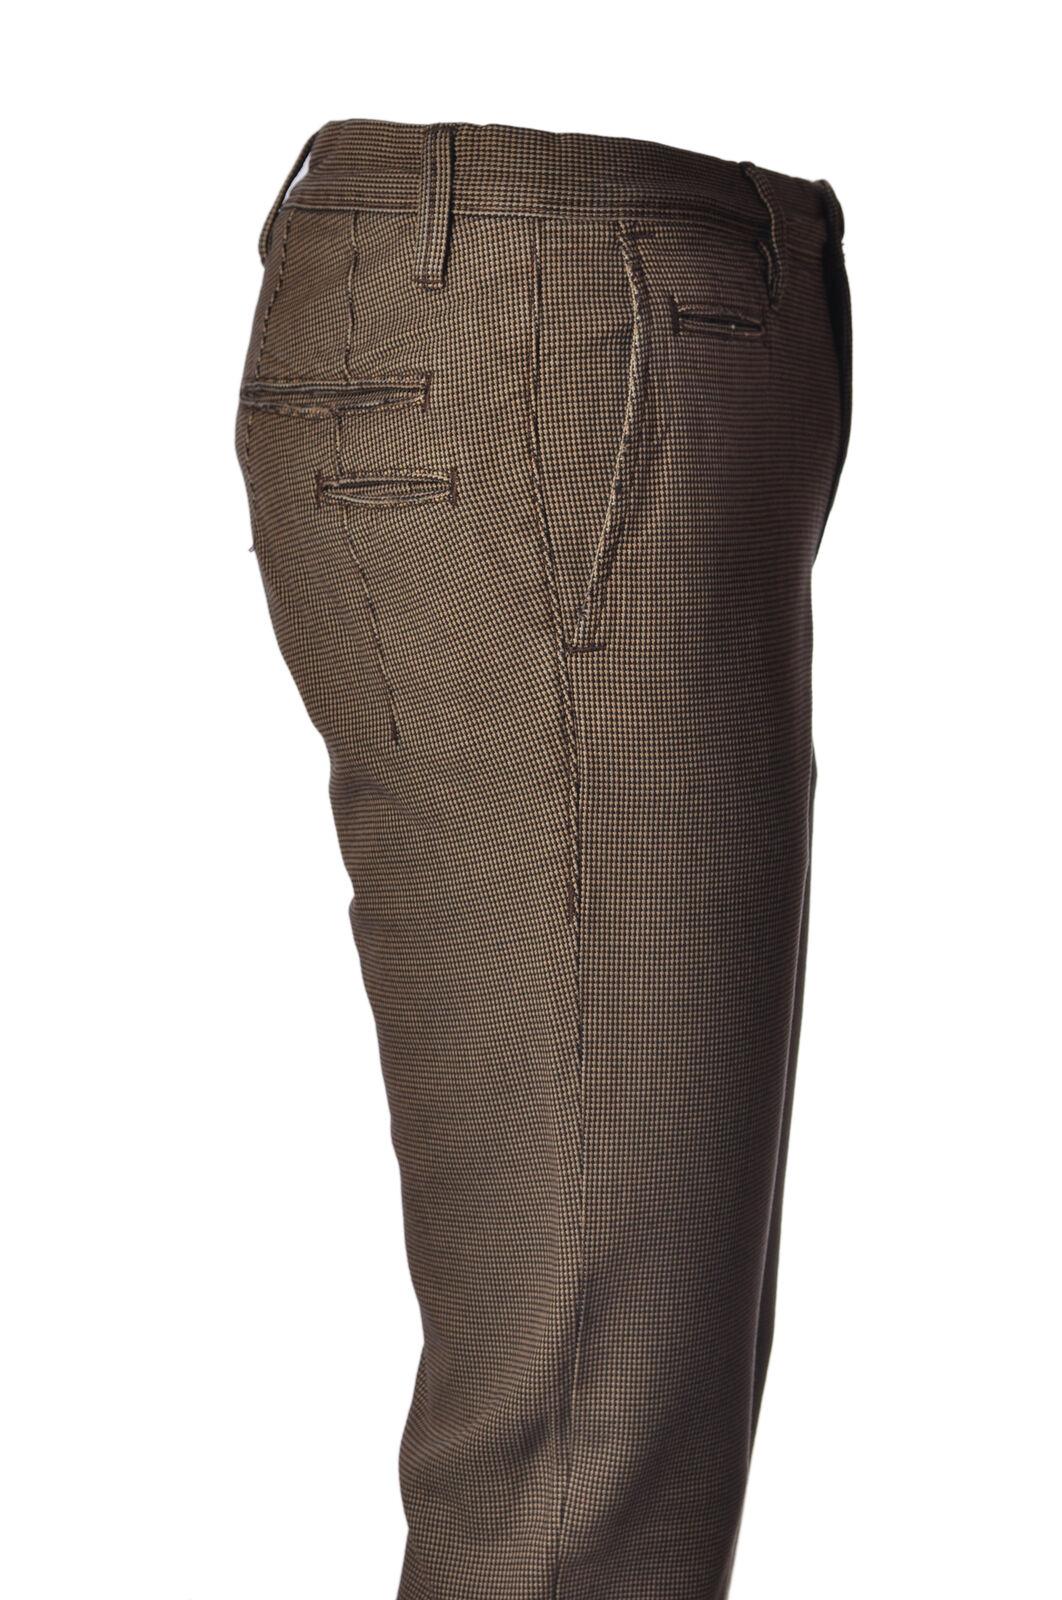 Siviglia - Pants-Pants - Man - Fantasy - 4683417D184201